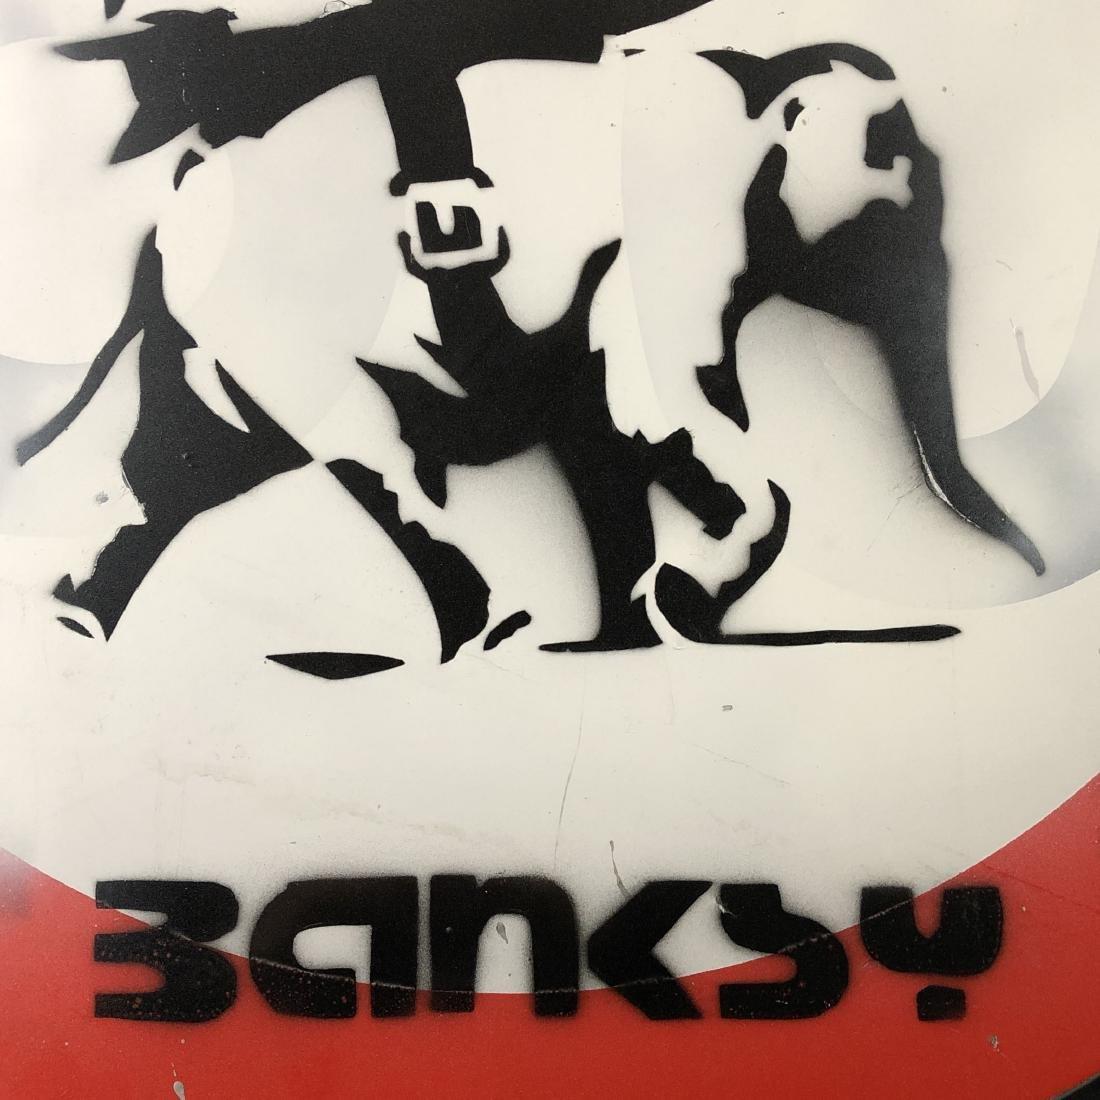 Banksy (British, 1974- ) - Graffiti Painting - style of - 3